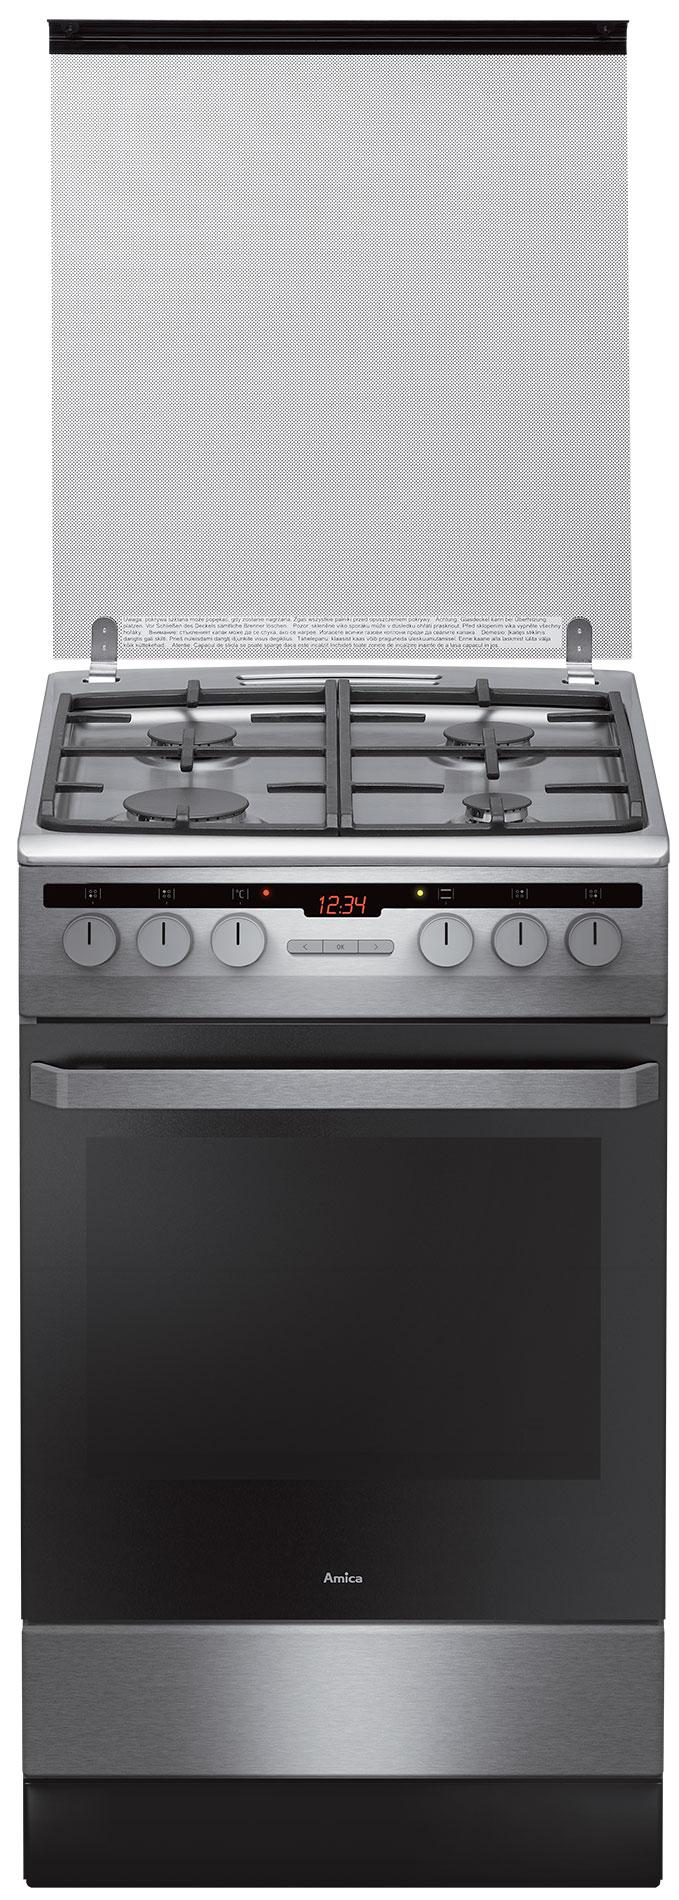 Free standing gas electric cooker 58GED3 33HZpTaDNAQ(Xx)  Amica -> Kuchnia Amica Super Line Instrukcja